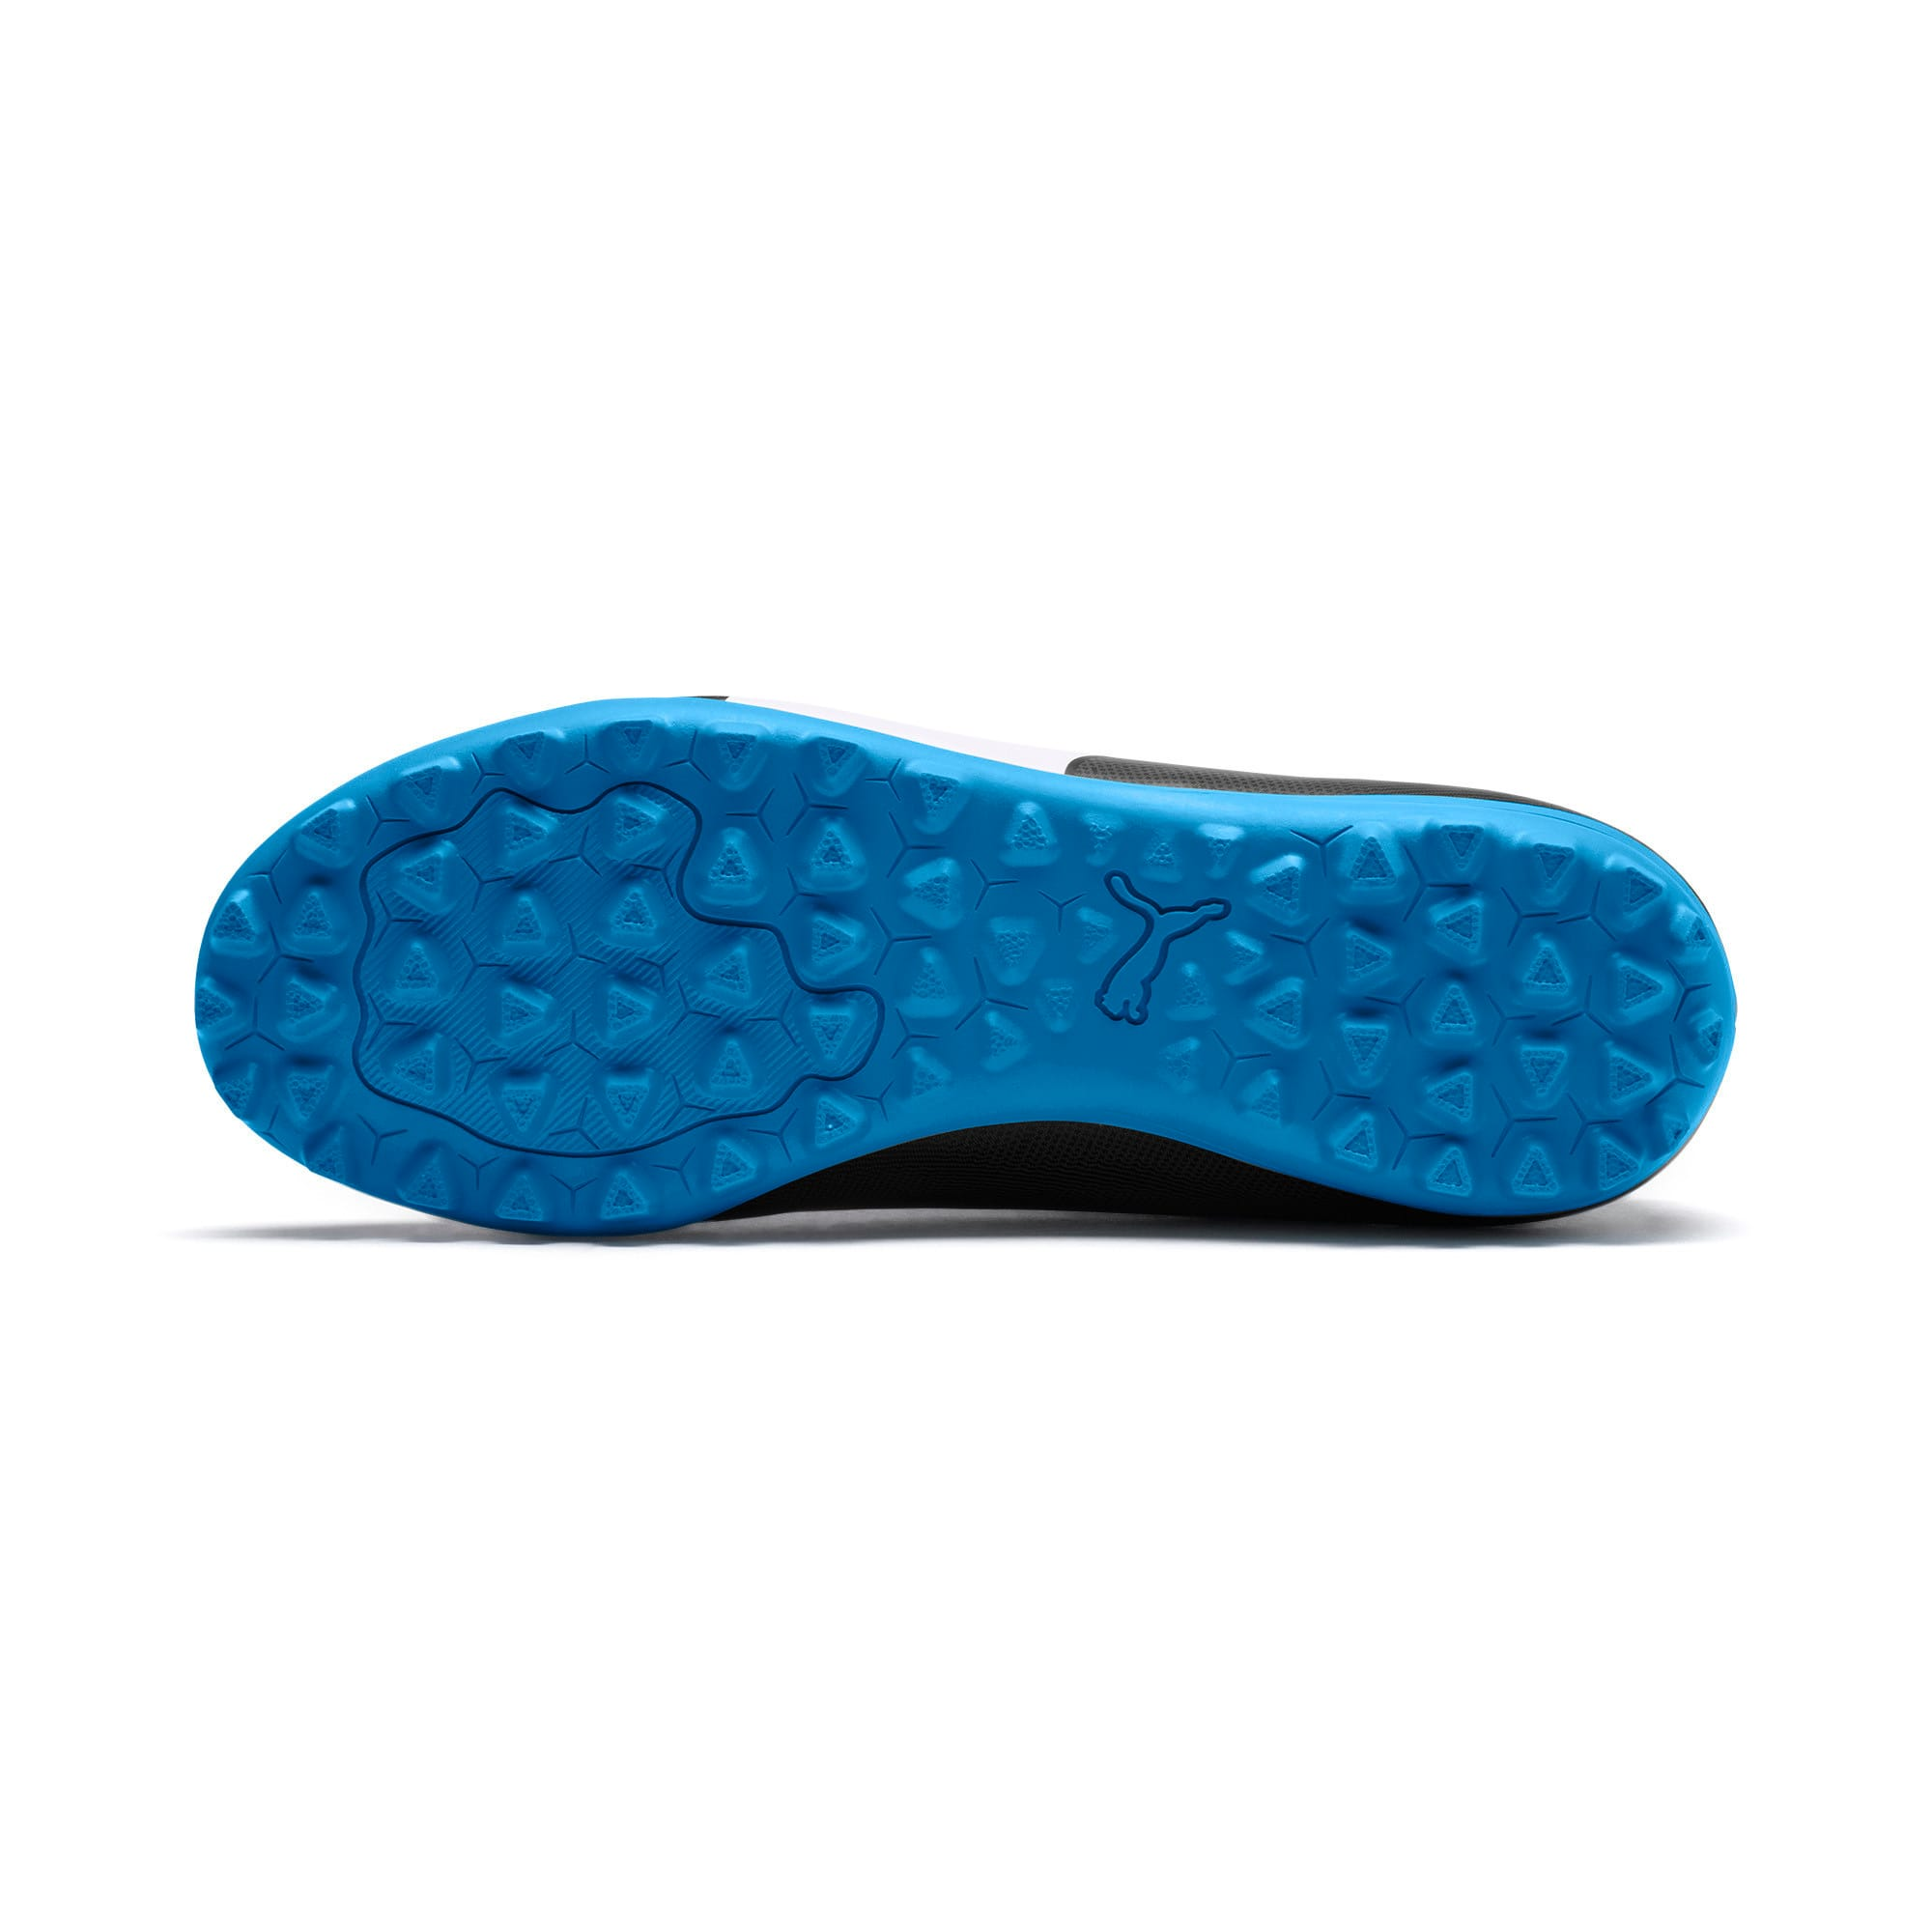 Thumbnail 4 of Rapido TT Youth Football Boots, Black-White-Iron Gate-Bleu, medium-IND